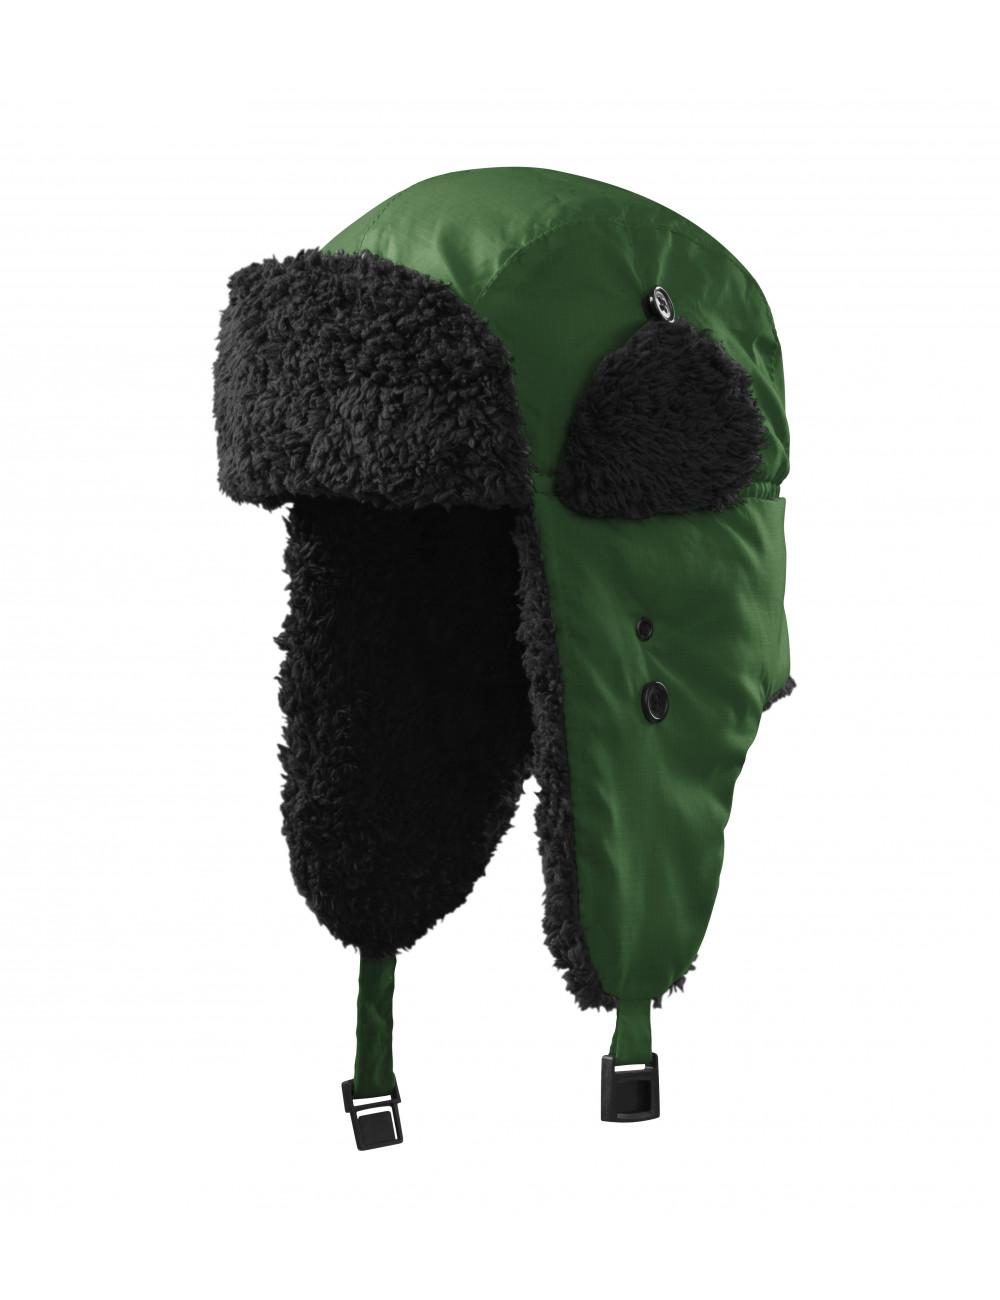 Adler MALFINI Czapka unisex Furry 326 zieleń butelkowa